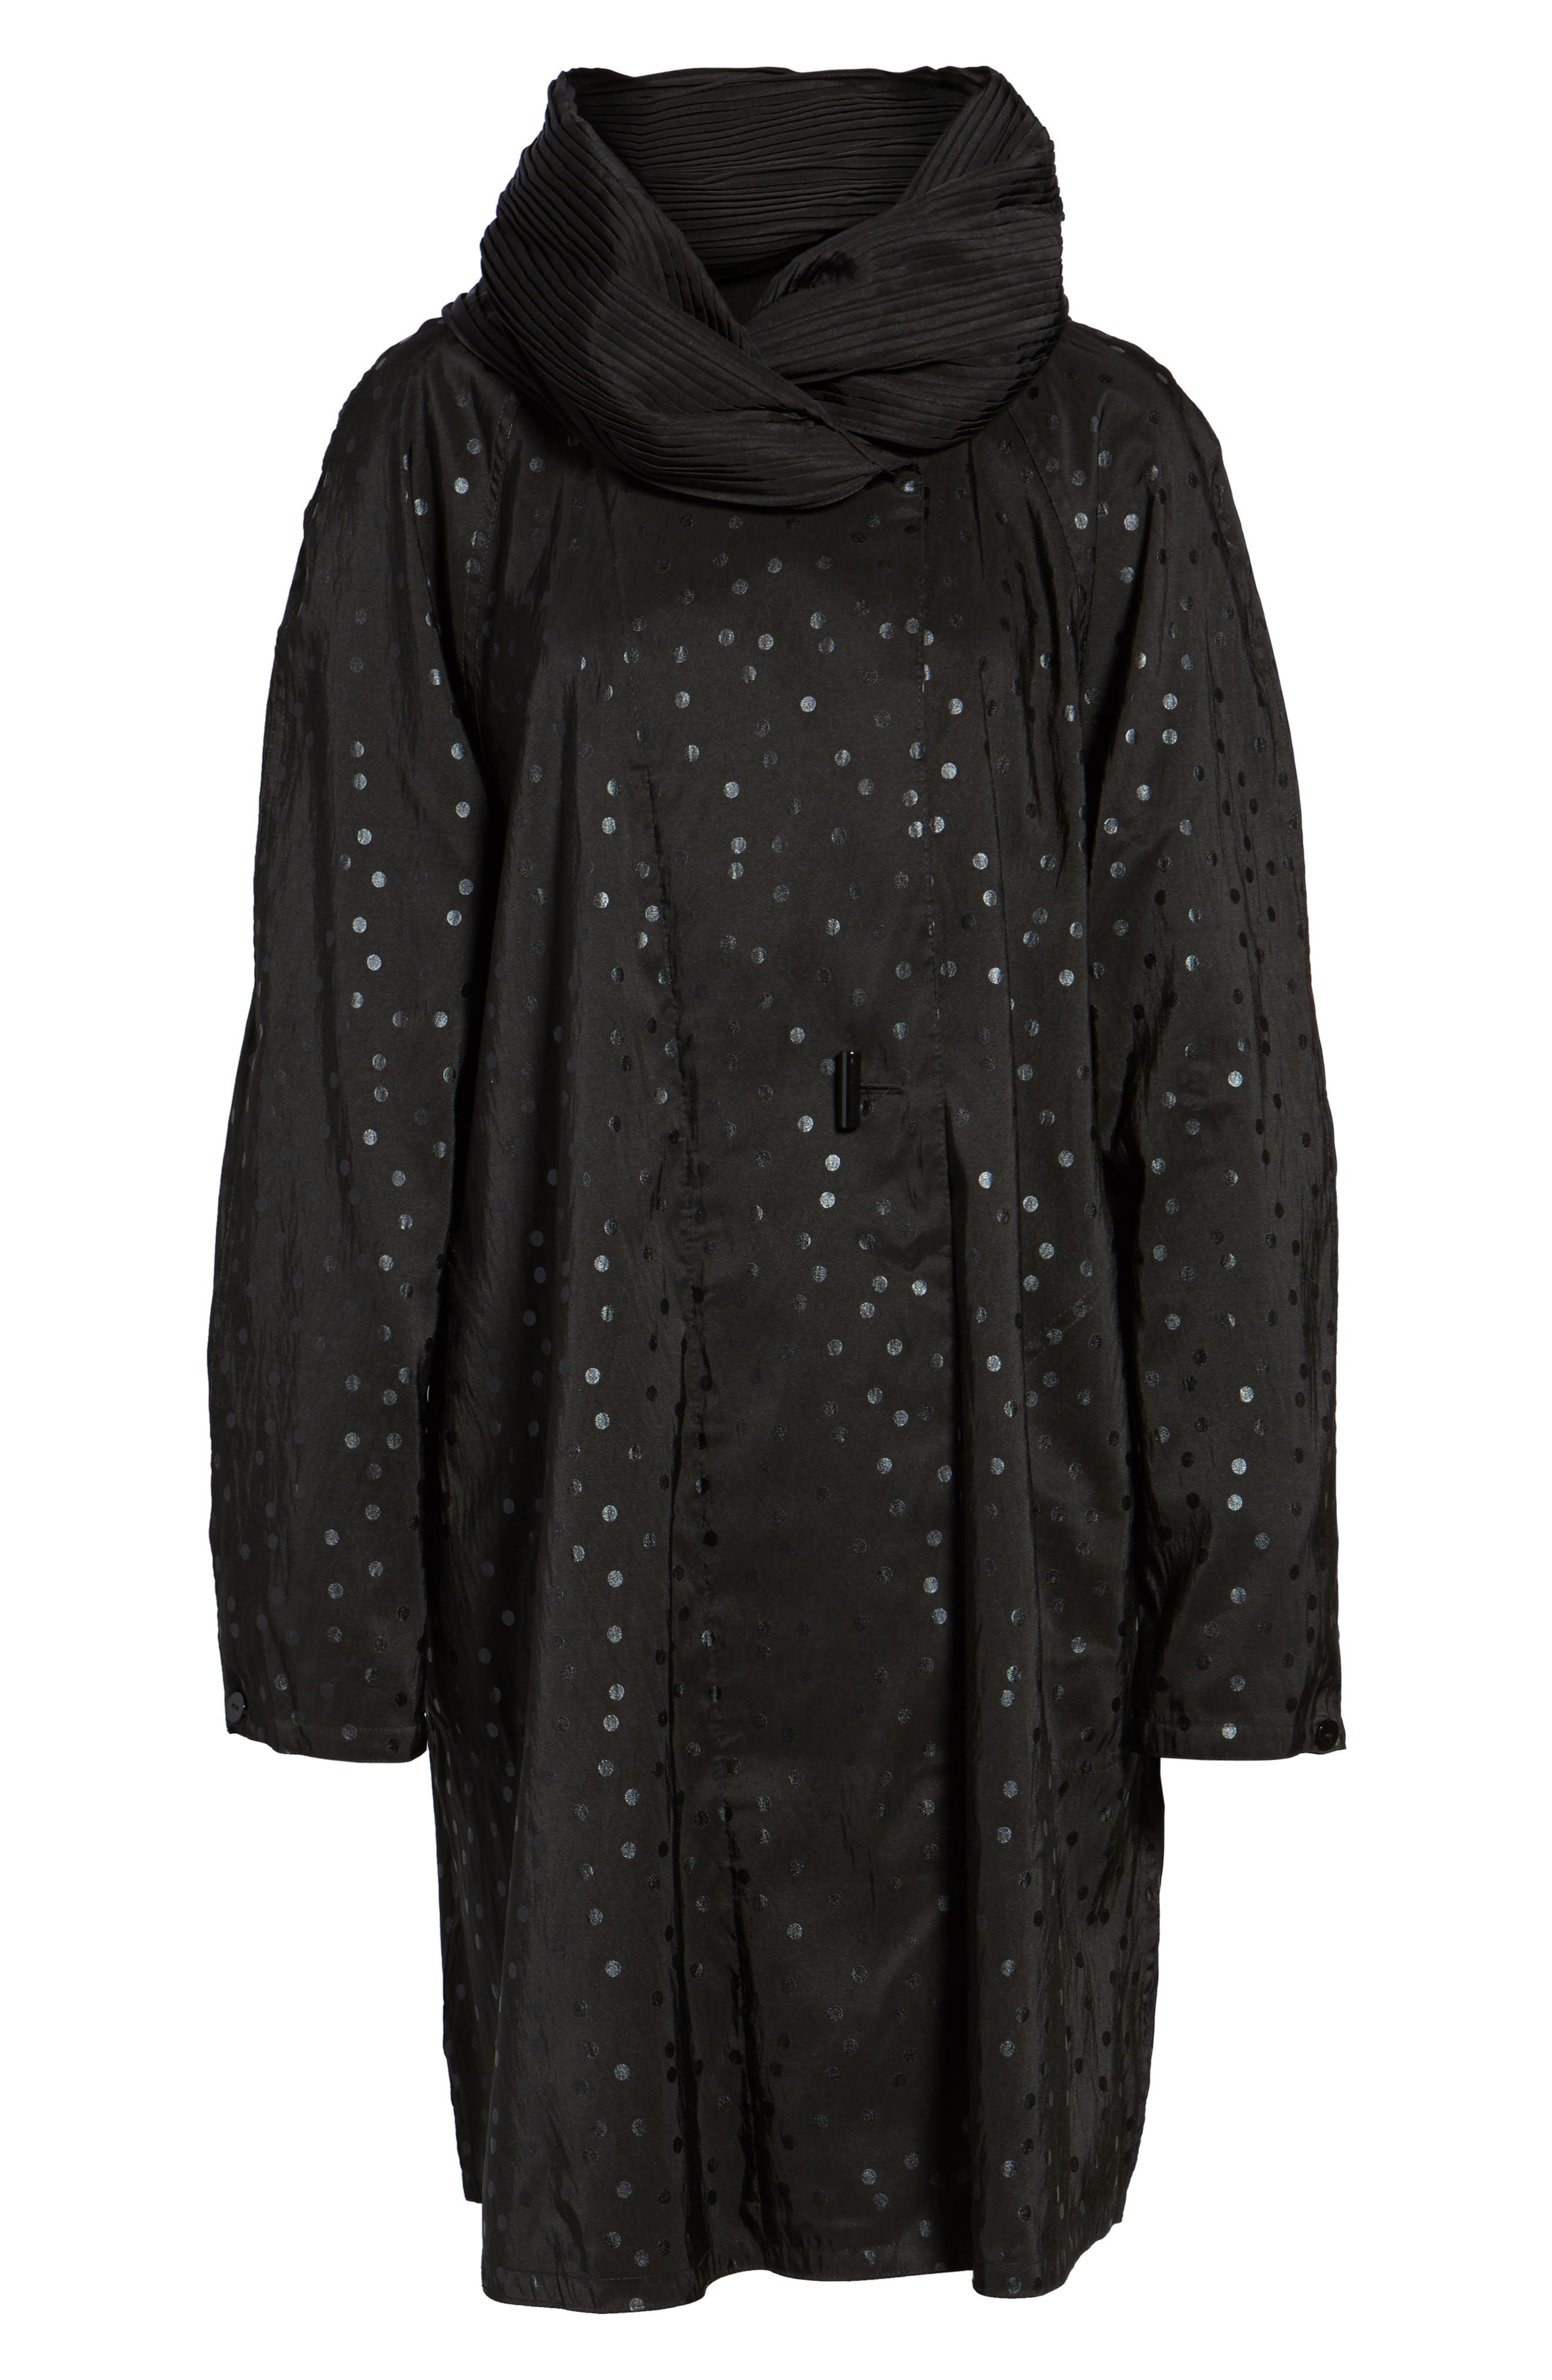 'Donatella' Reversible Dot Pleat Hood Packable Travel Coat,                             Alternate thumbnail 6, color,                             Black Dot